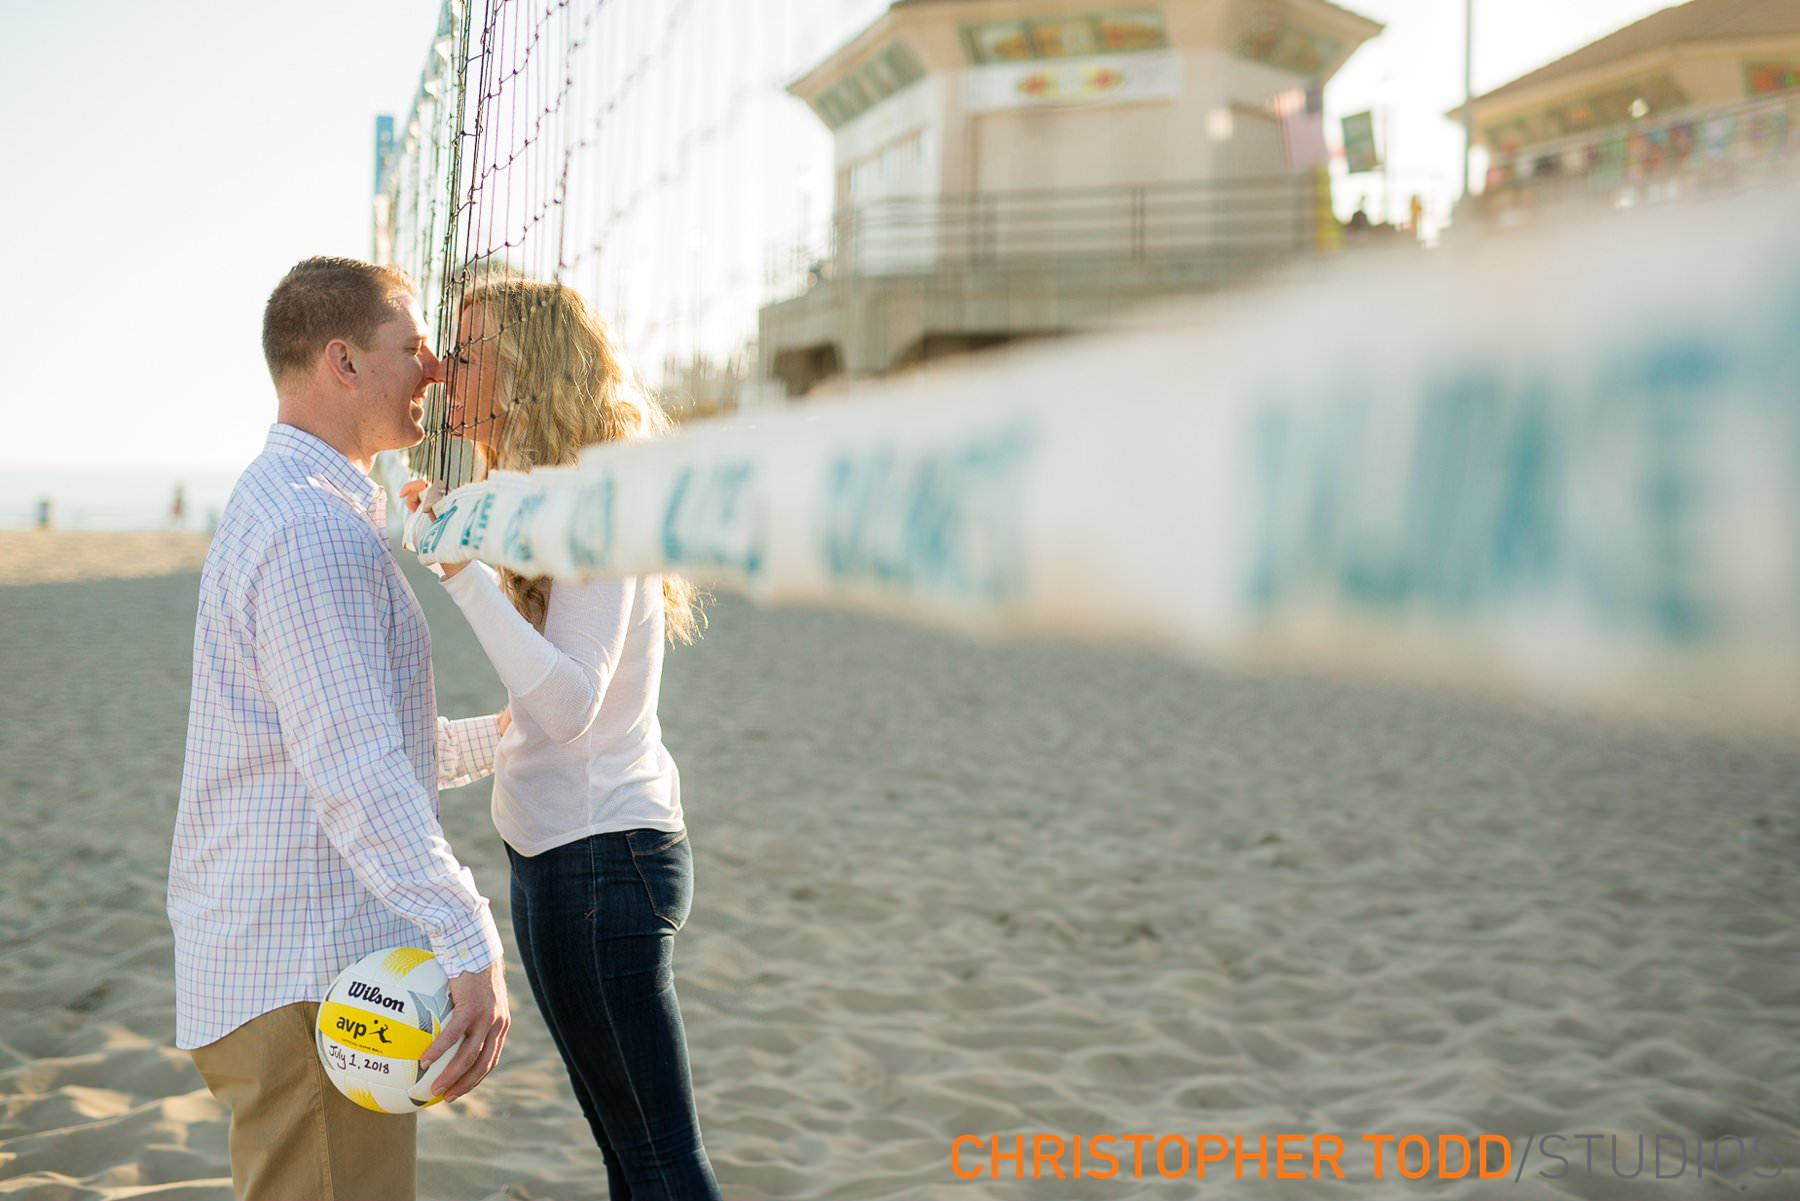 fun-engagement-photographer-in-huntington-beach